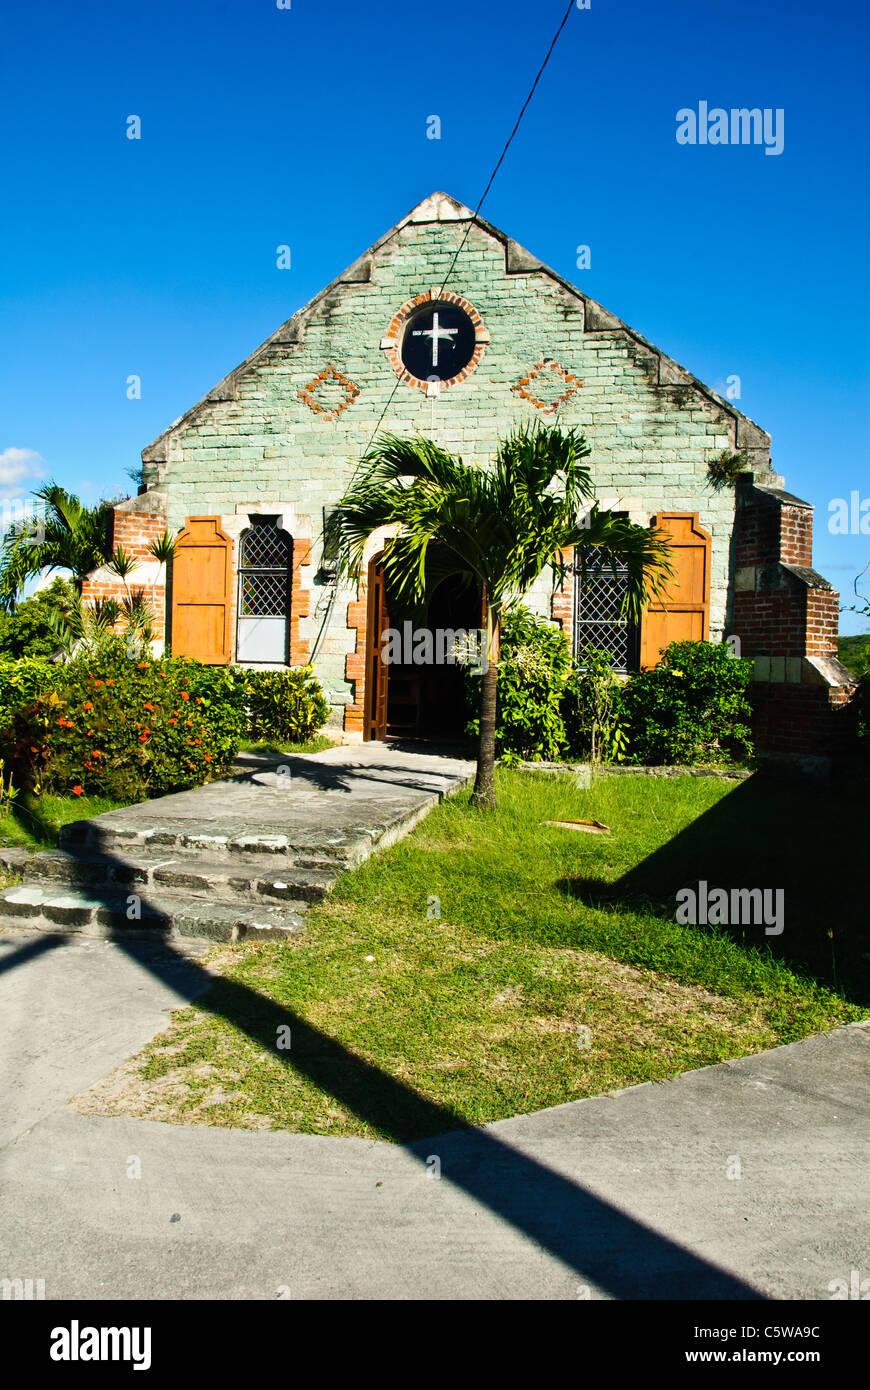 St. Barnabas Anglican Church, Liberta, Antigua - Stock Image